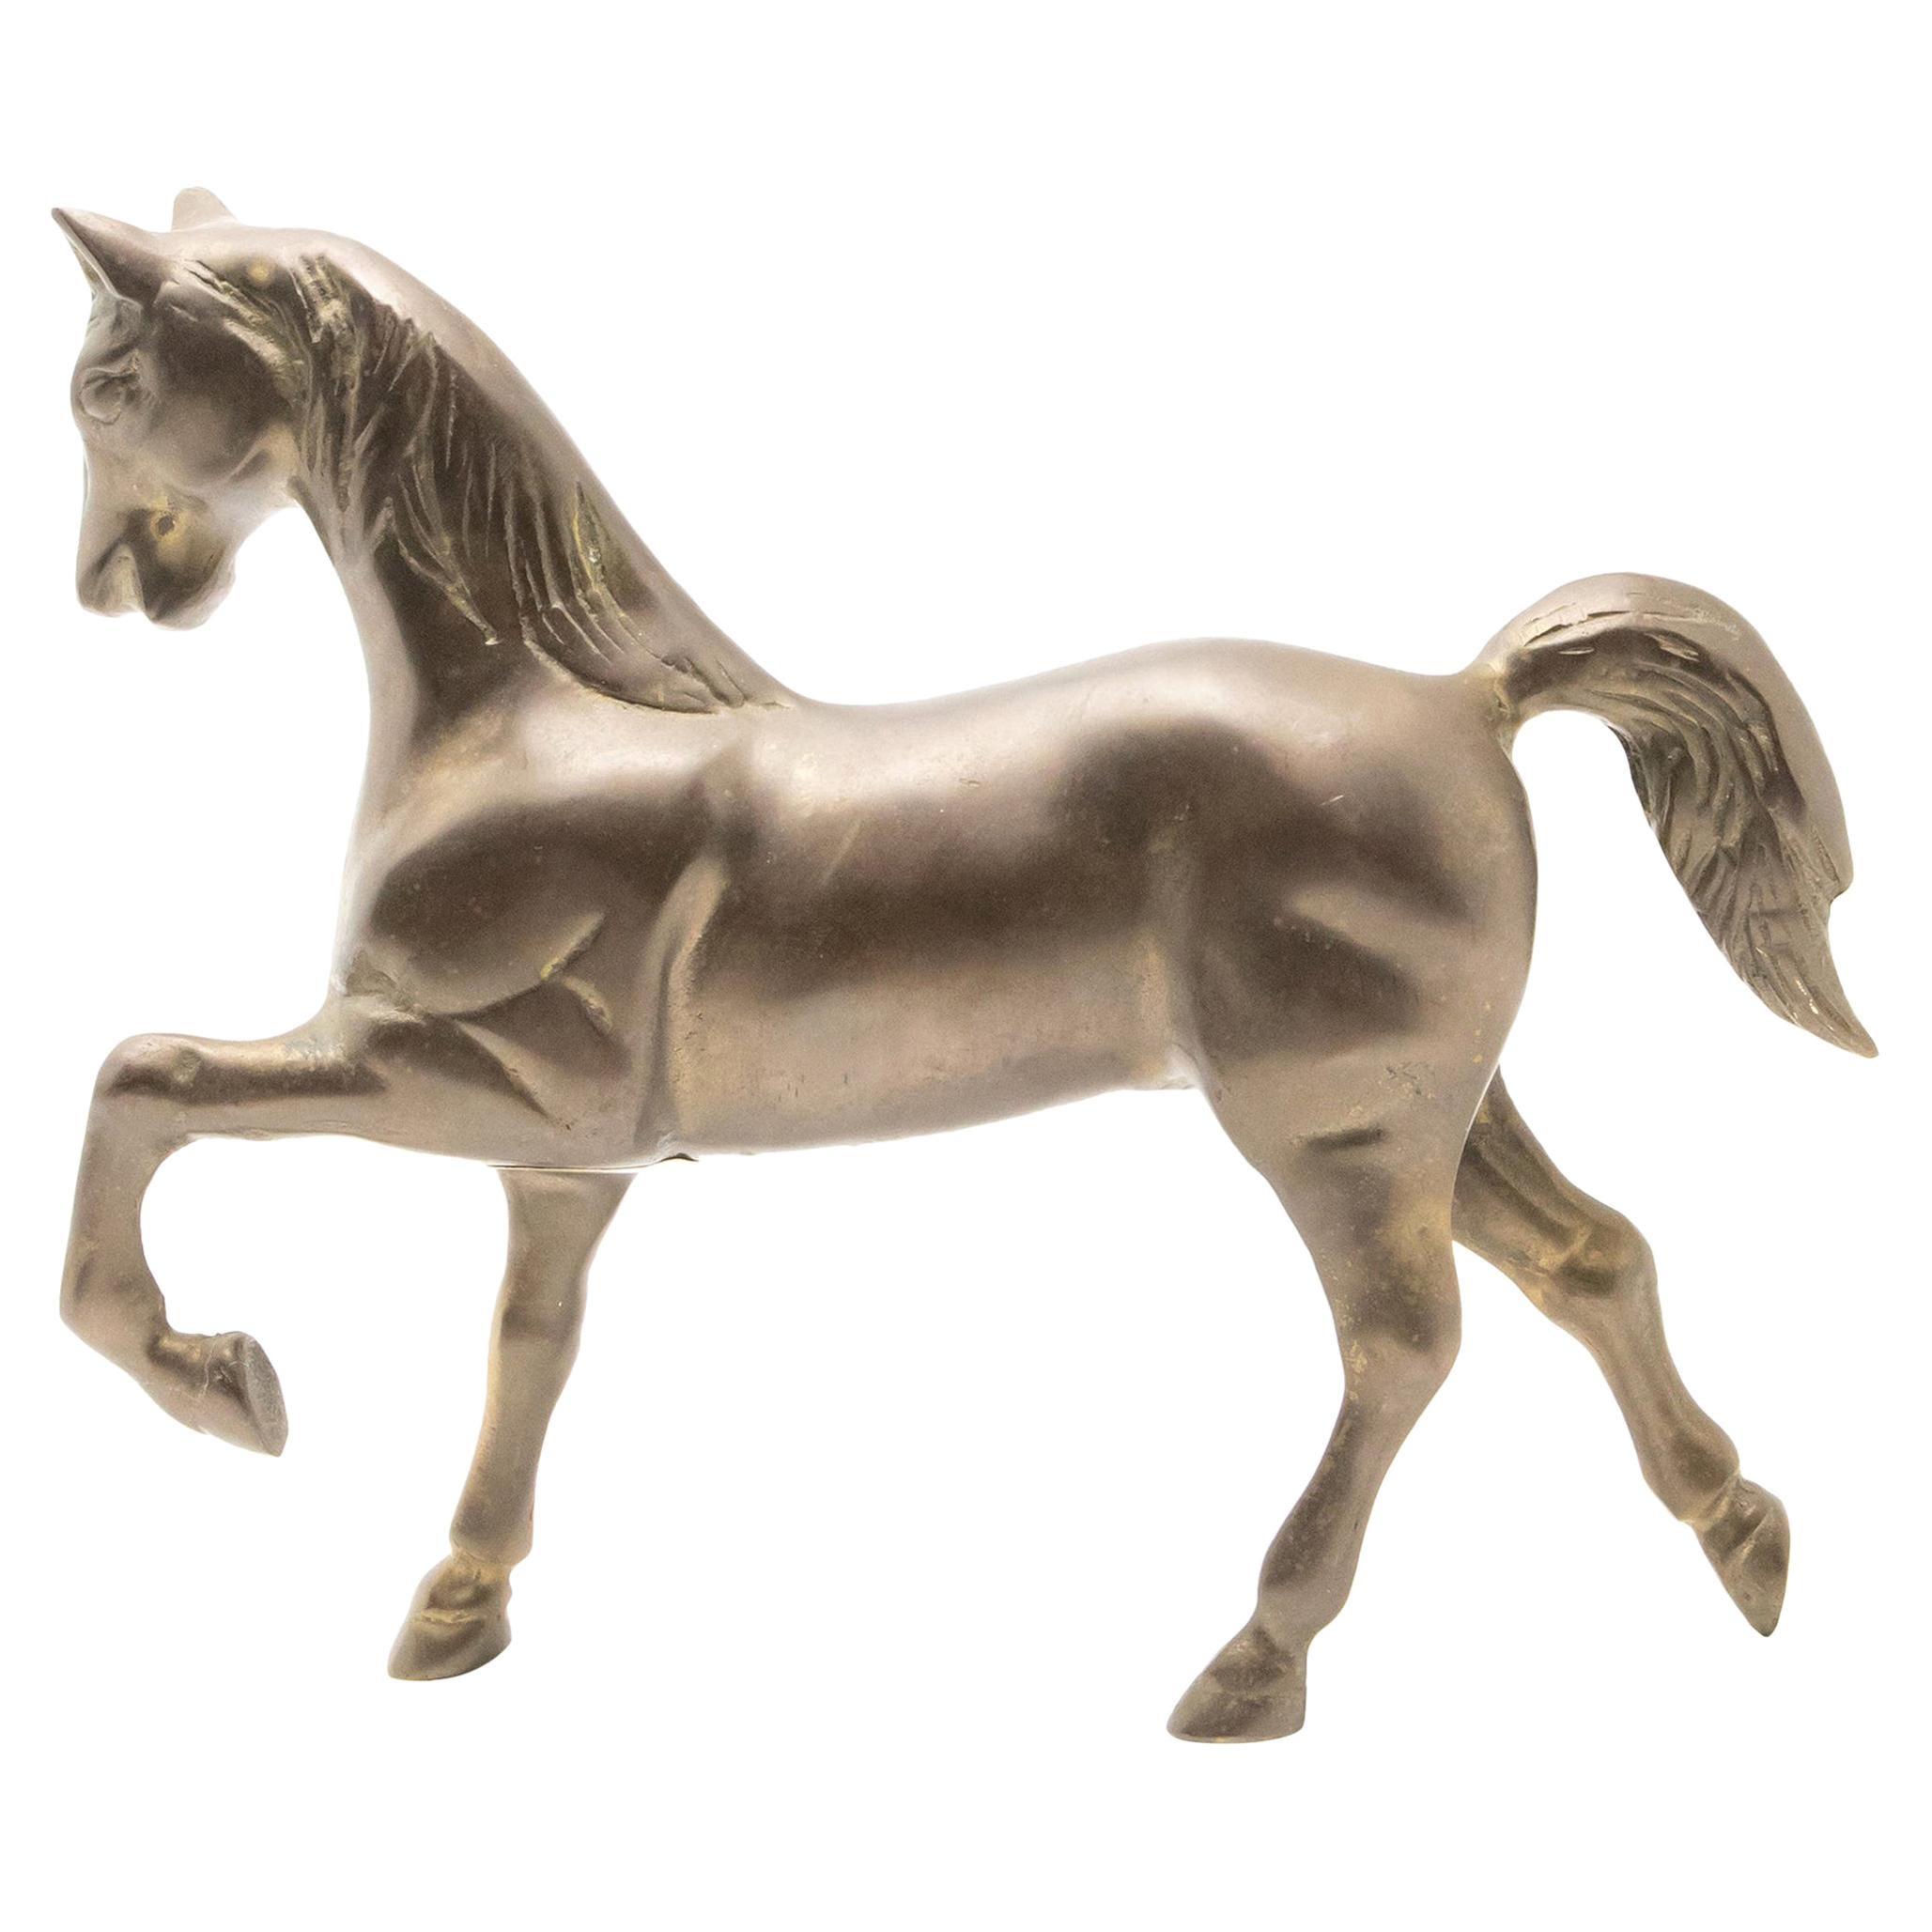 Solid Brass Standing Horse Figure